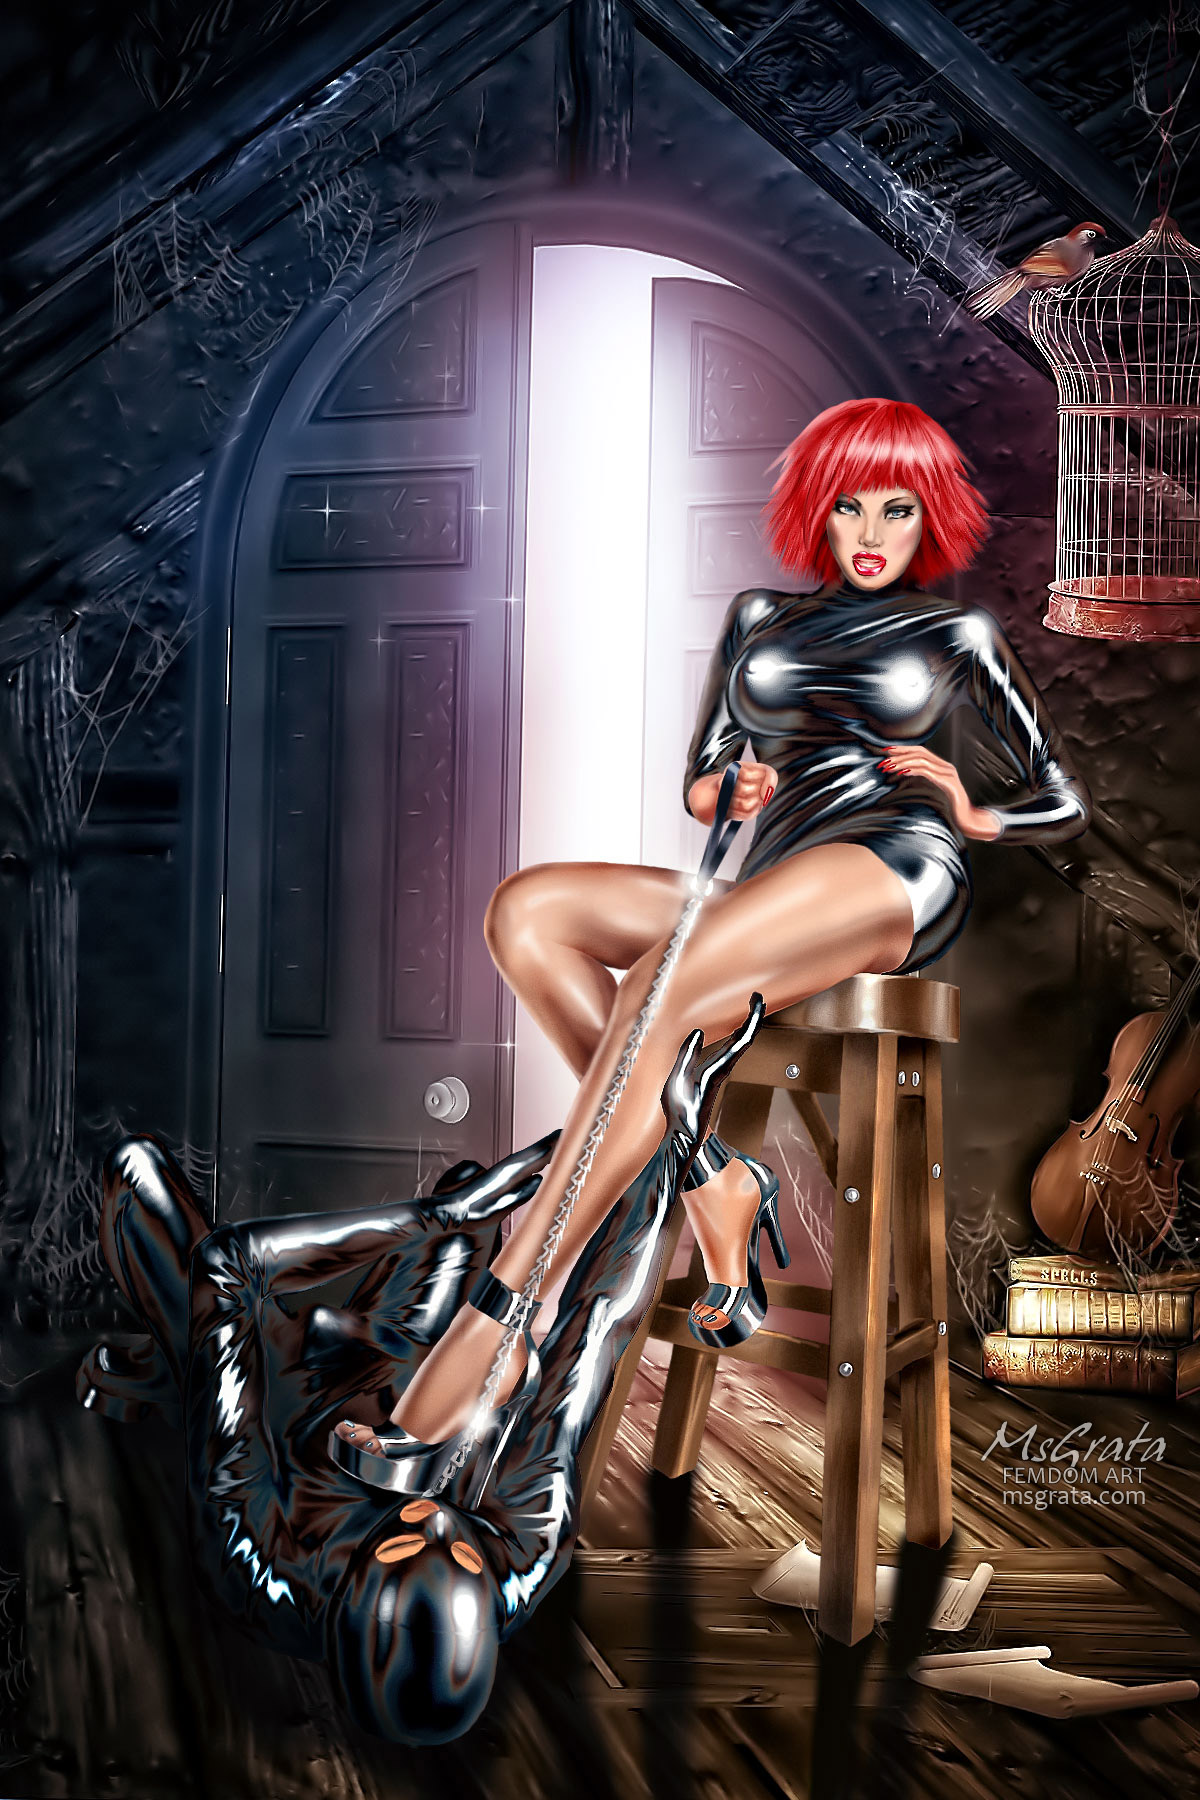 Leggy Supreme under her feet latex dominatrix high heels worship femdom art by MsGrata